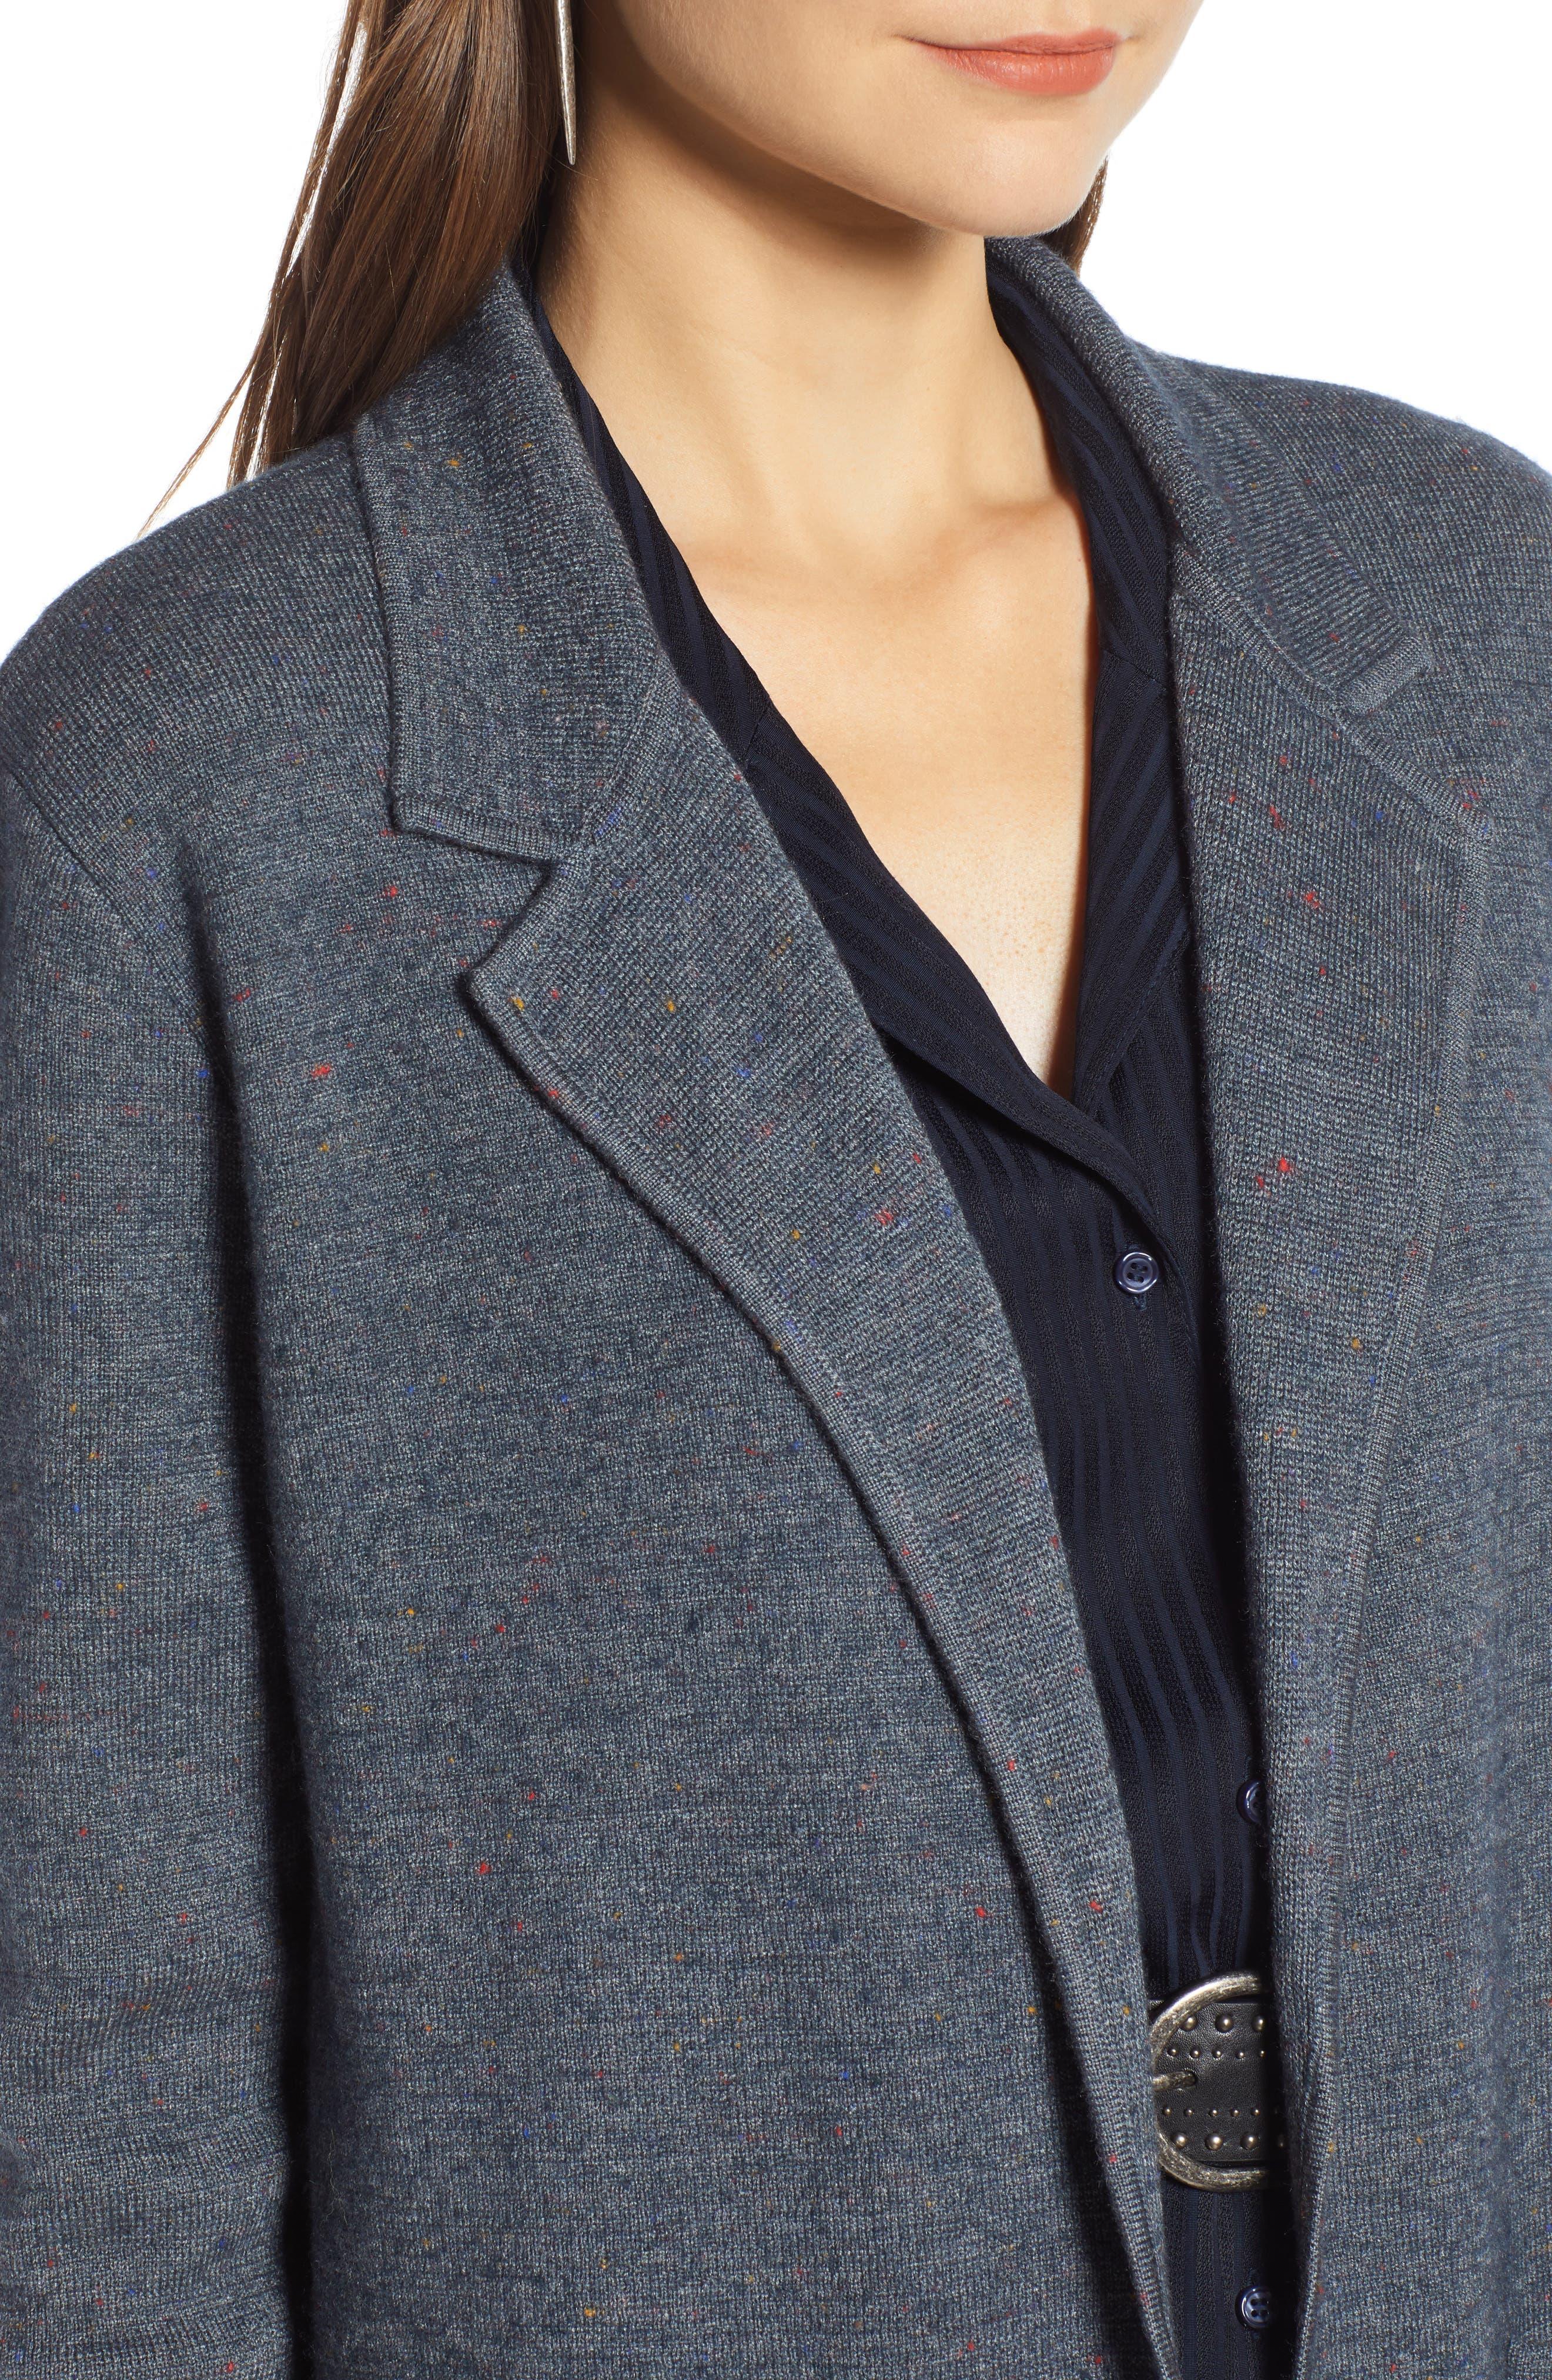 Sweater Blazer,                             Alternate thumbnail 4, color,                             GREY MEDIUM CHARCOAL HEATHER